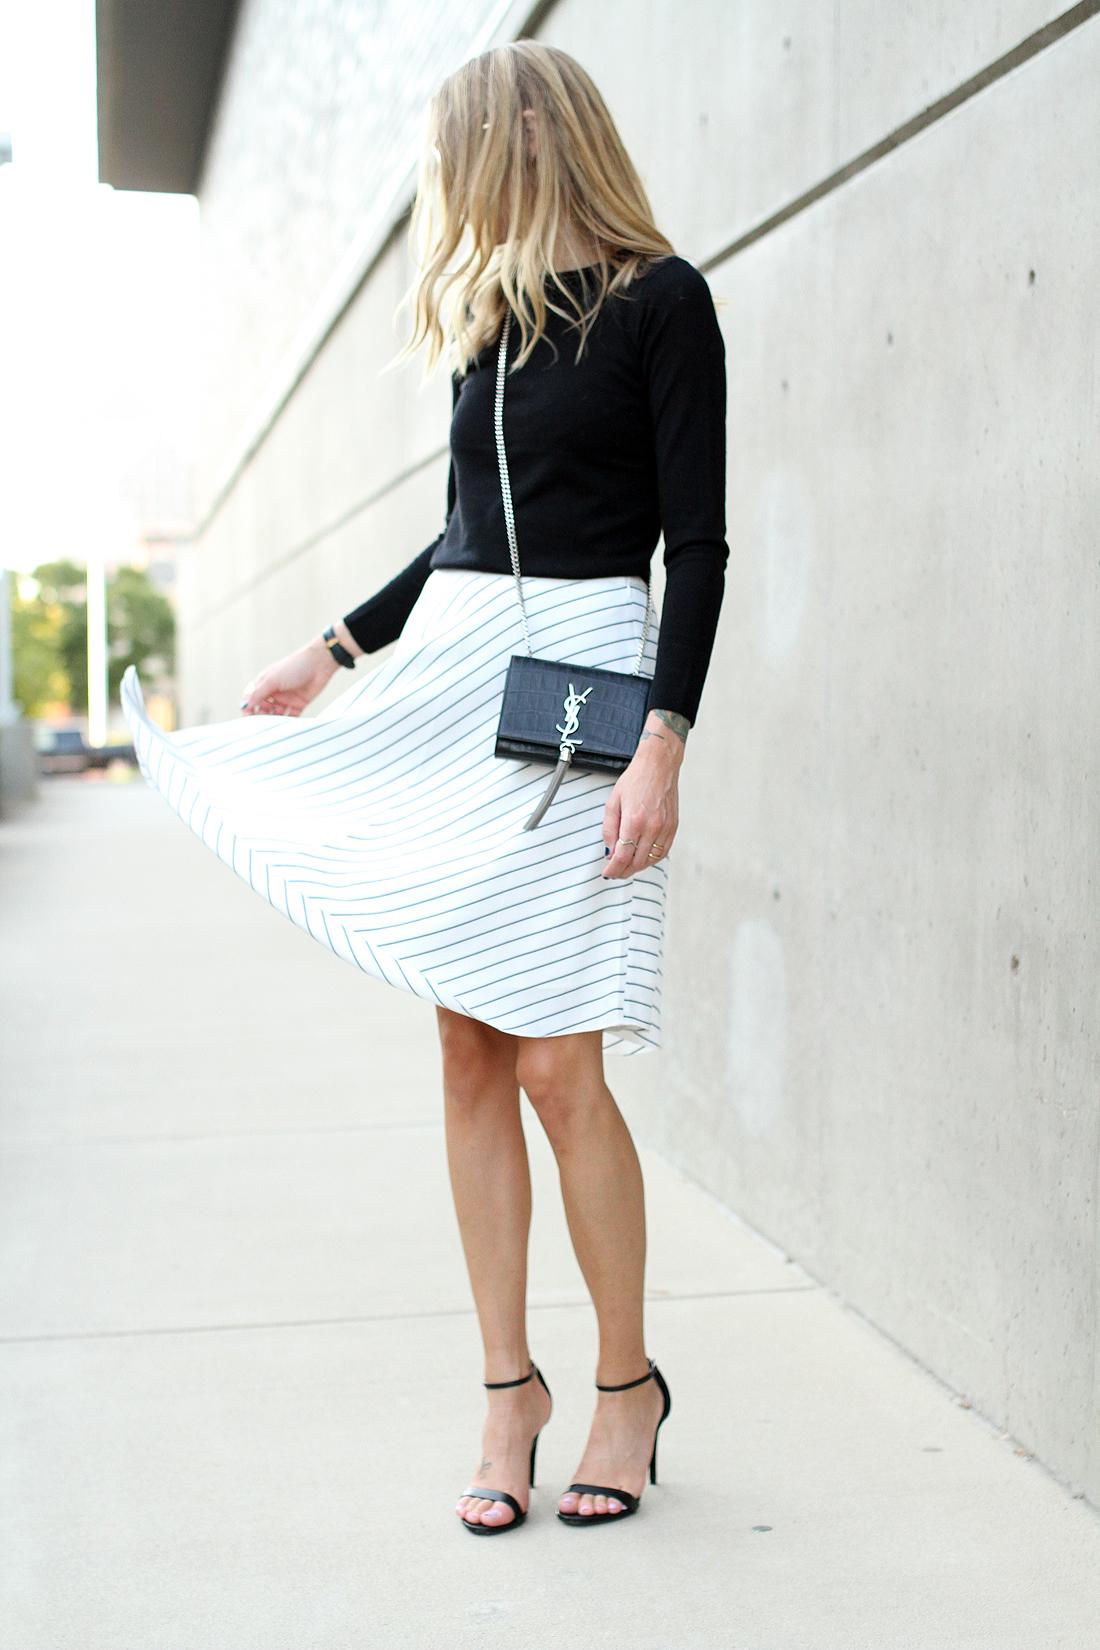 fashion-jackson-club-monaco-white-asymmetrical-skirt-black-sweater-saint-laurent-tassel-crossbody-black-ankle-strap-heels